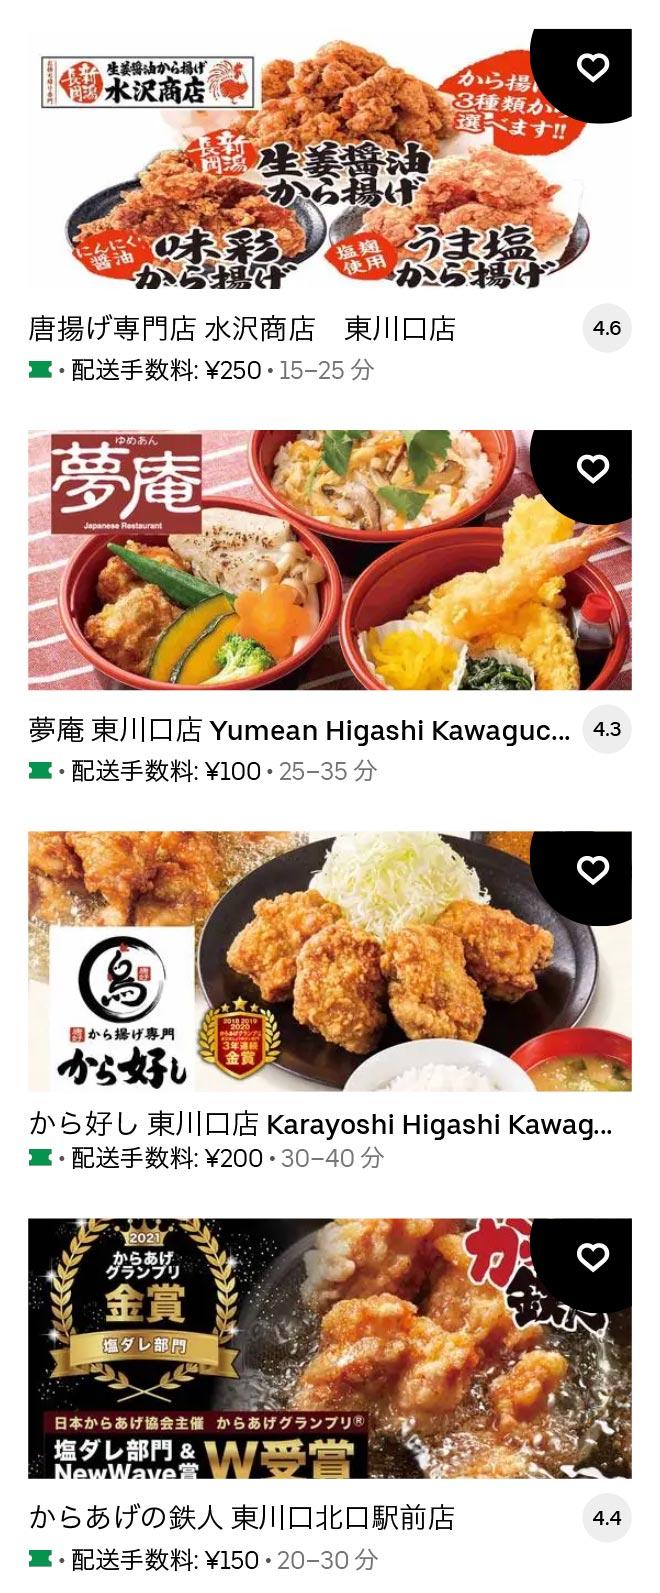 U higashi kawaguchi 2104 02